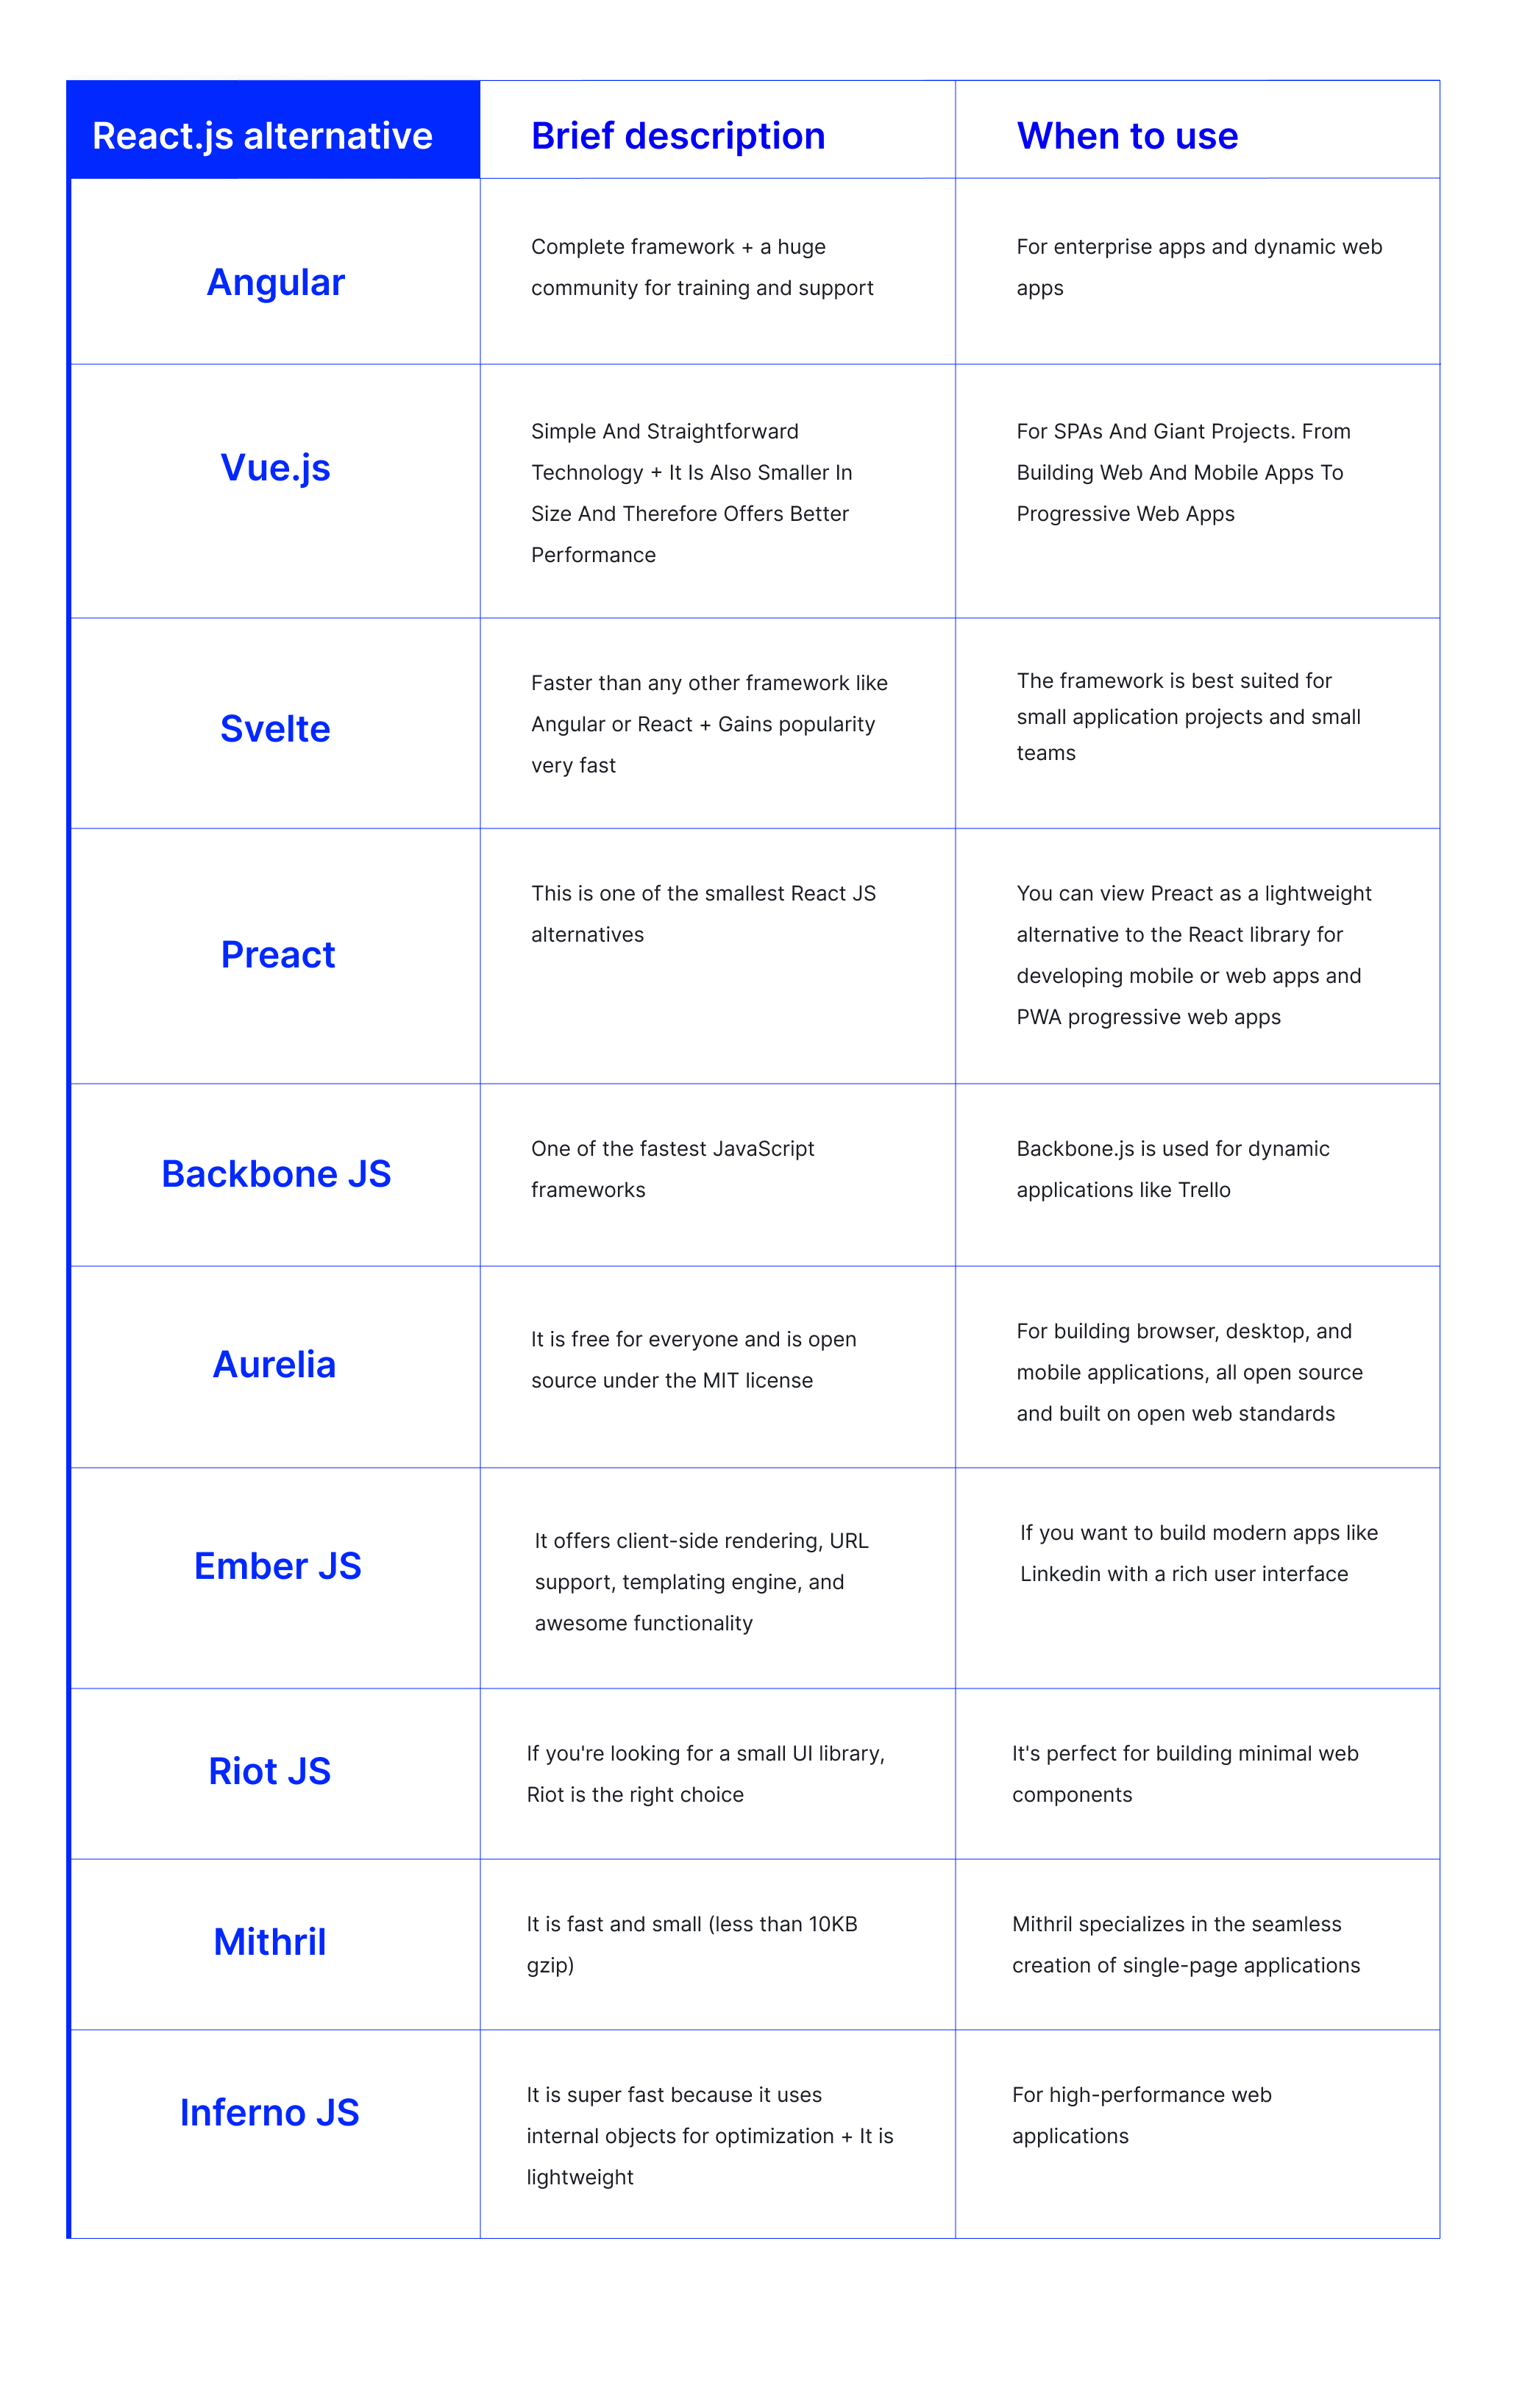 Best reactjs alternatives summary table